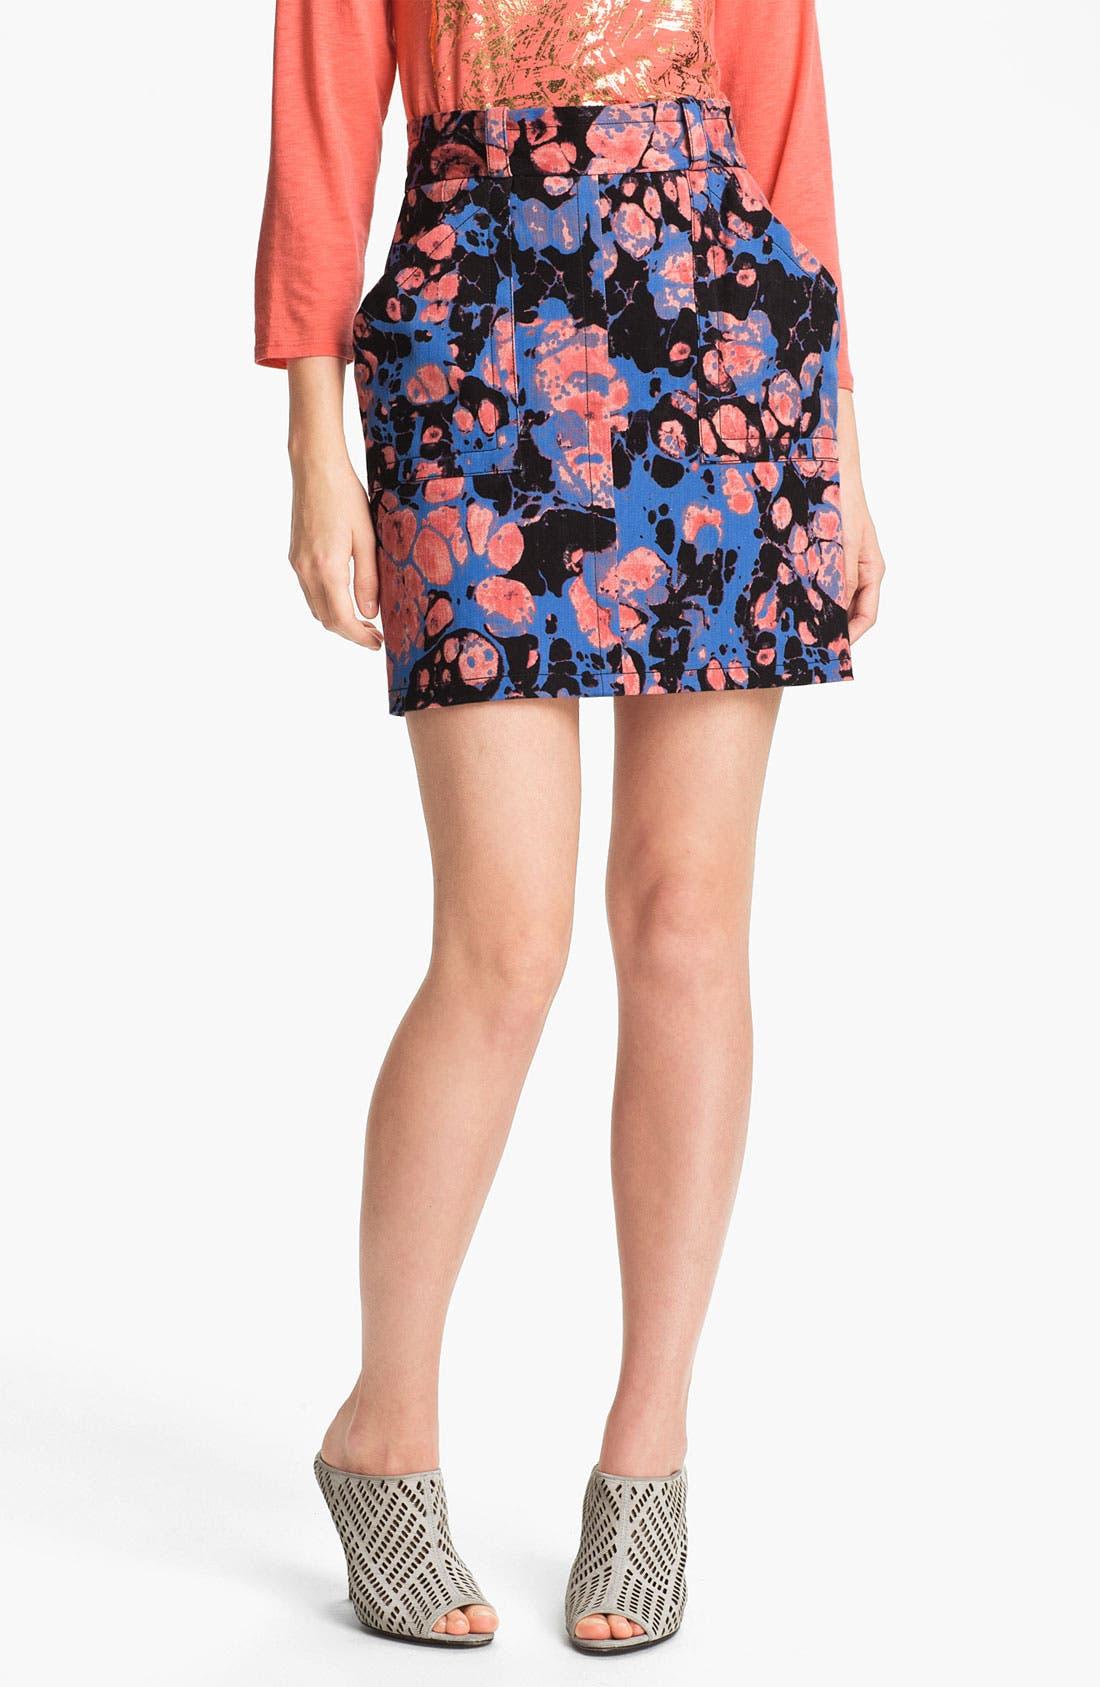 Main Image - Kelly Wearstler 'Phenomena' Skirt